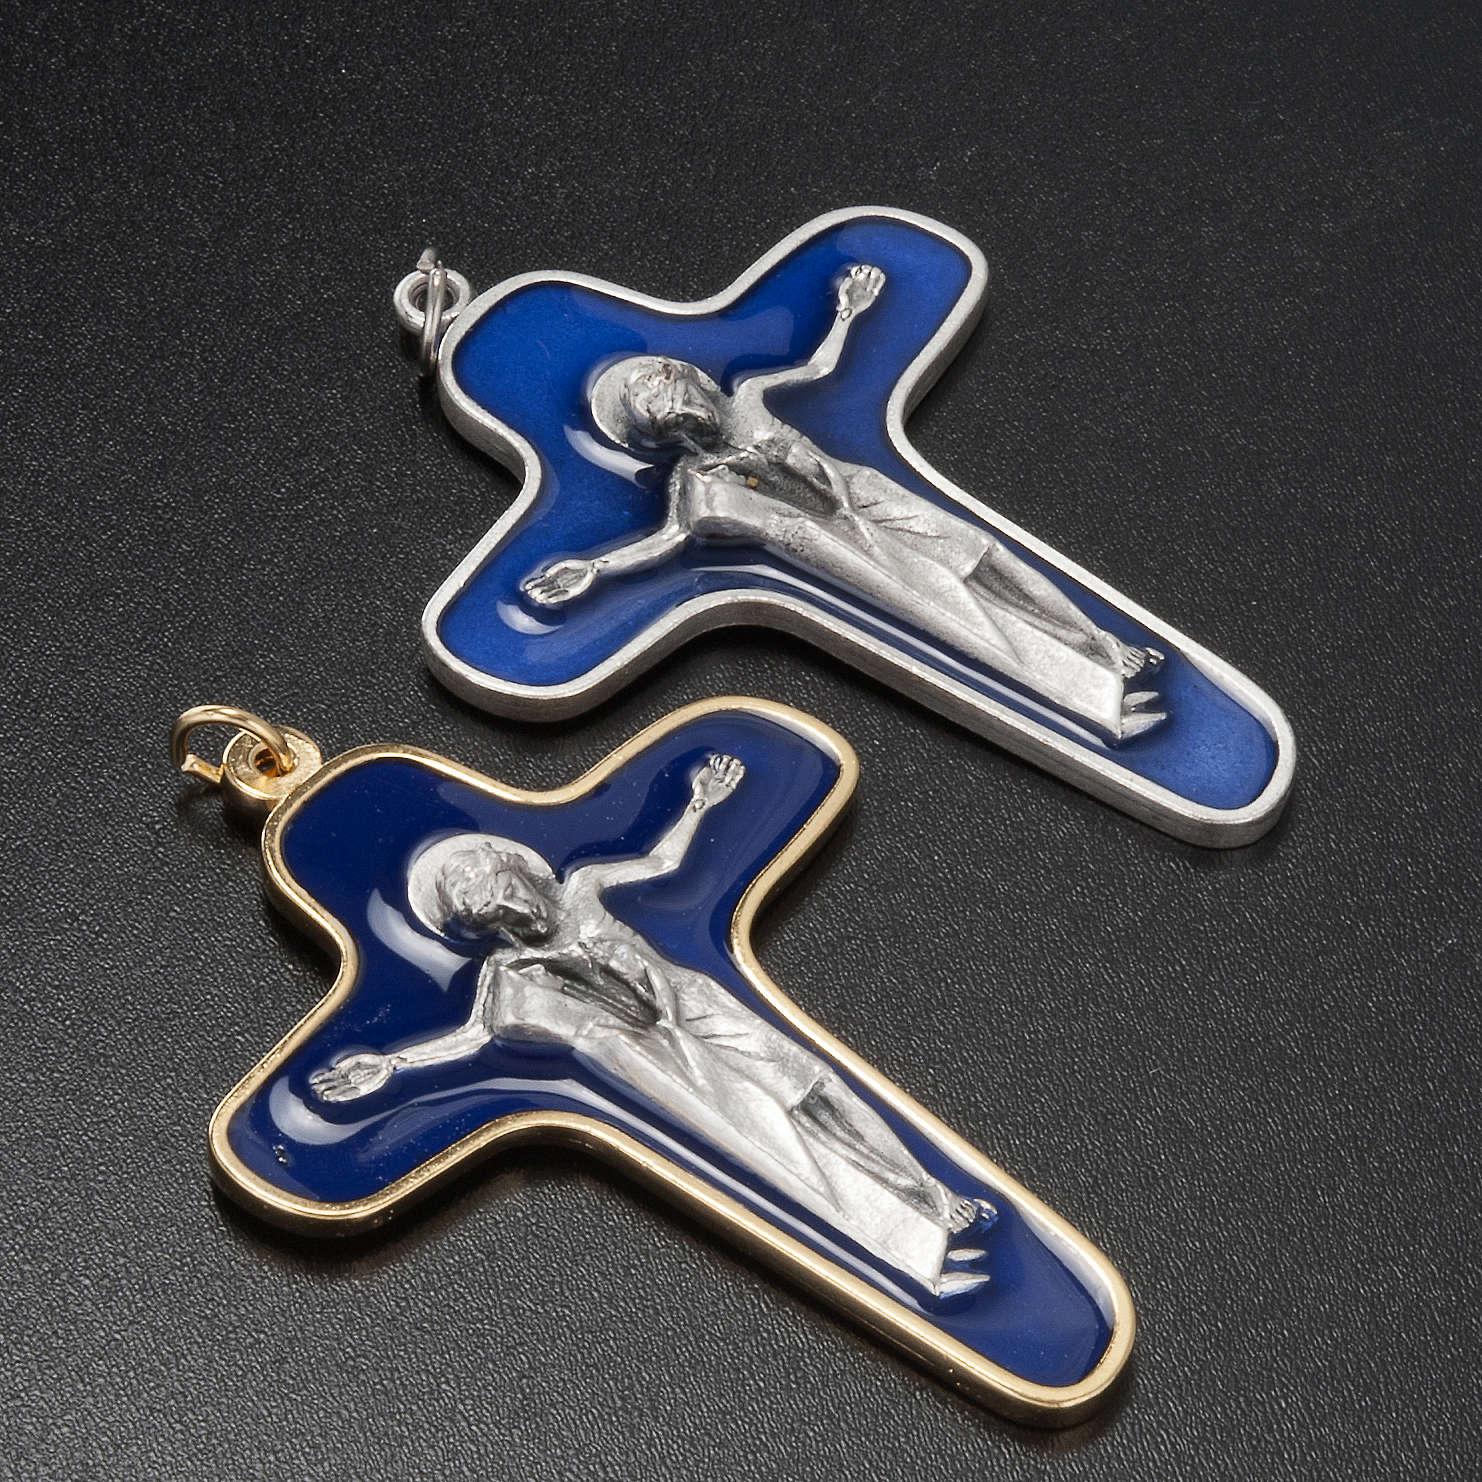 Wisiorek krzyż metal farba niebieska Maryja i Chrystus 86mm 4